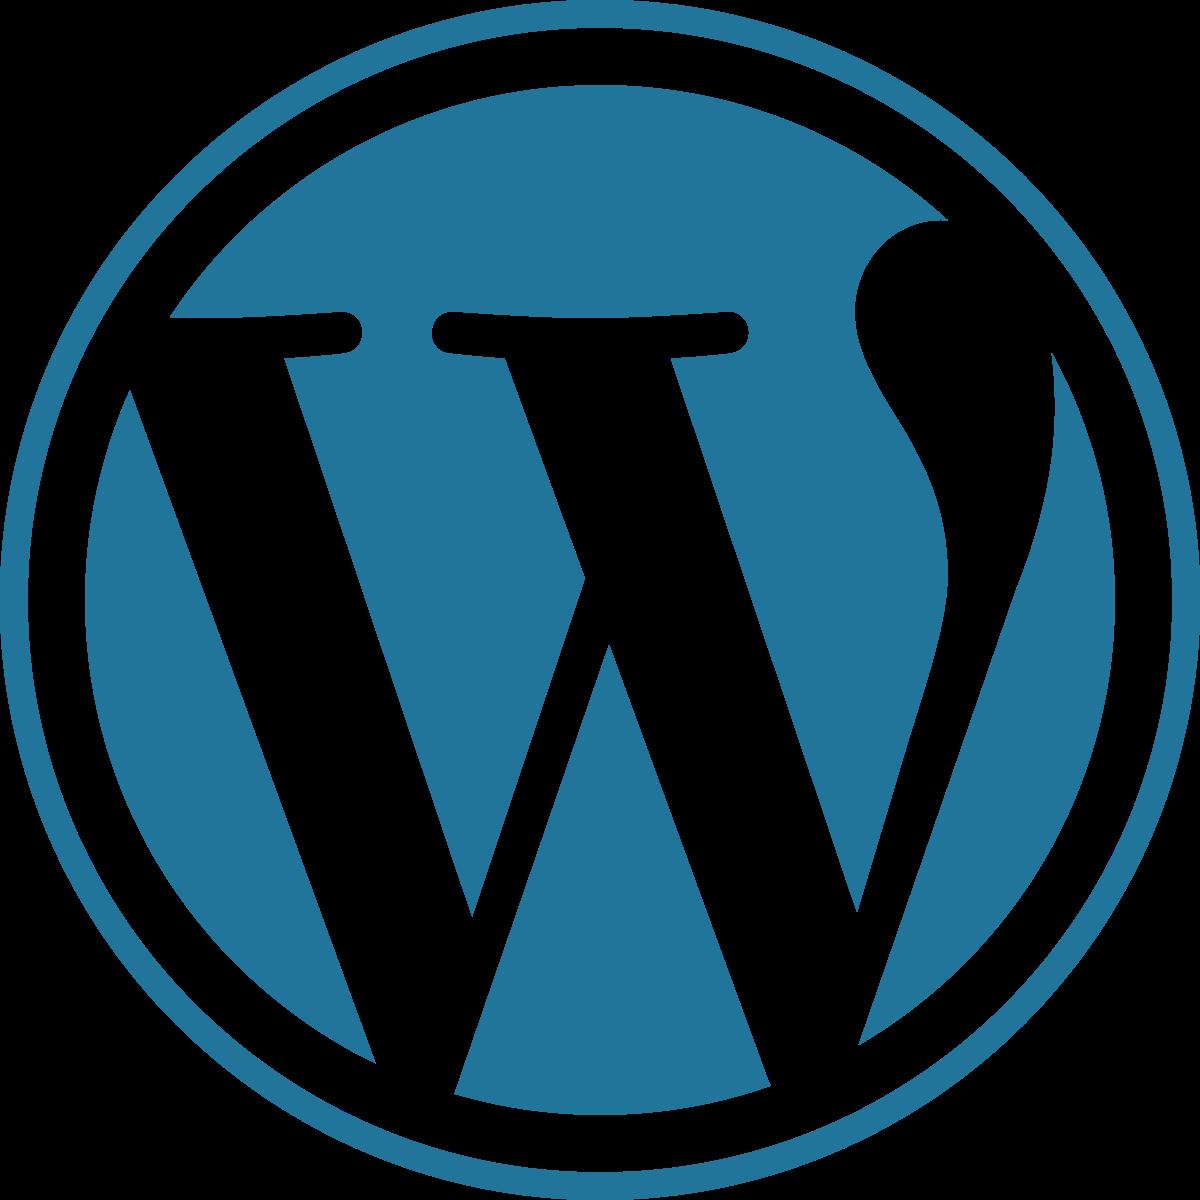 thumb_WDMyCloud_WordPress_4.7.png